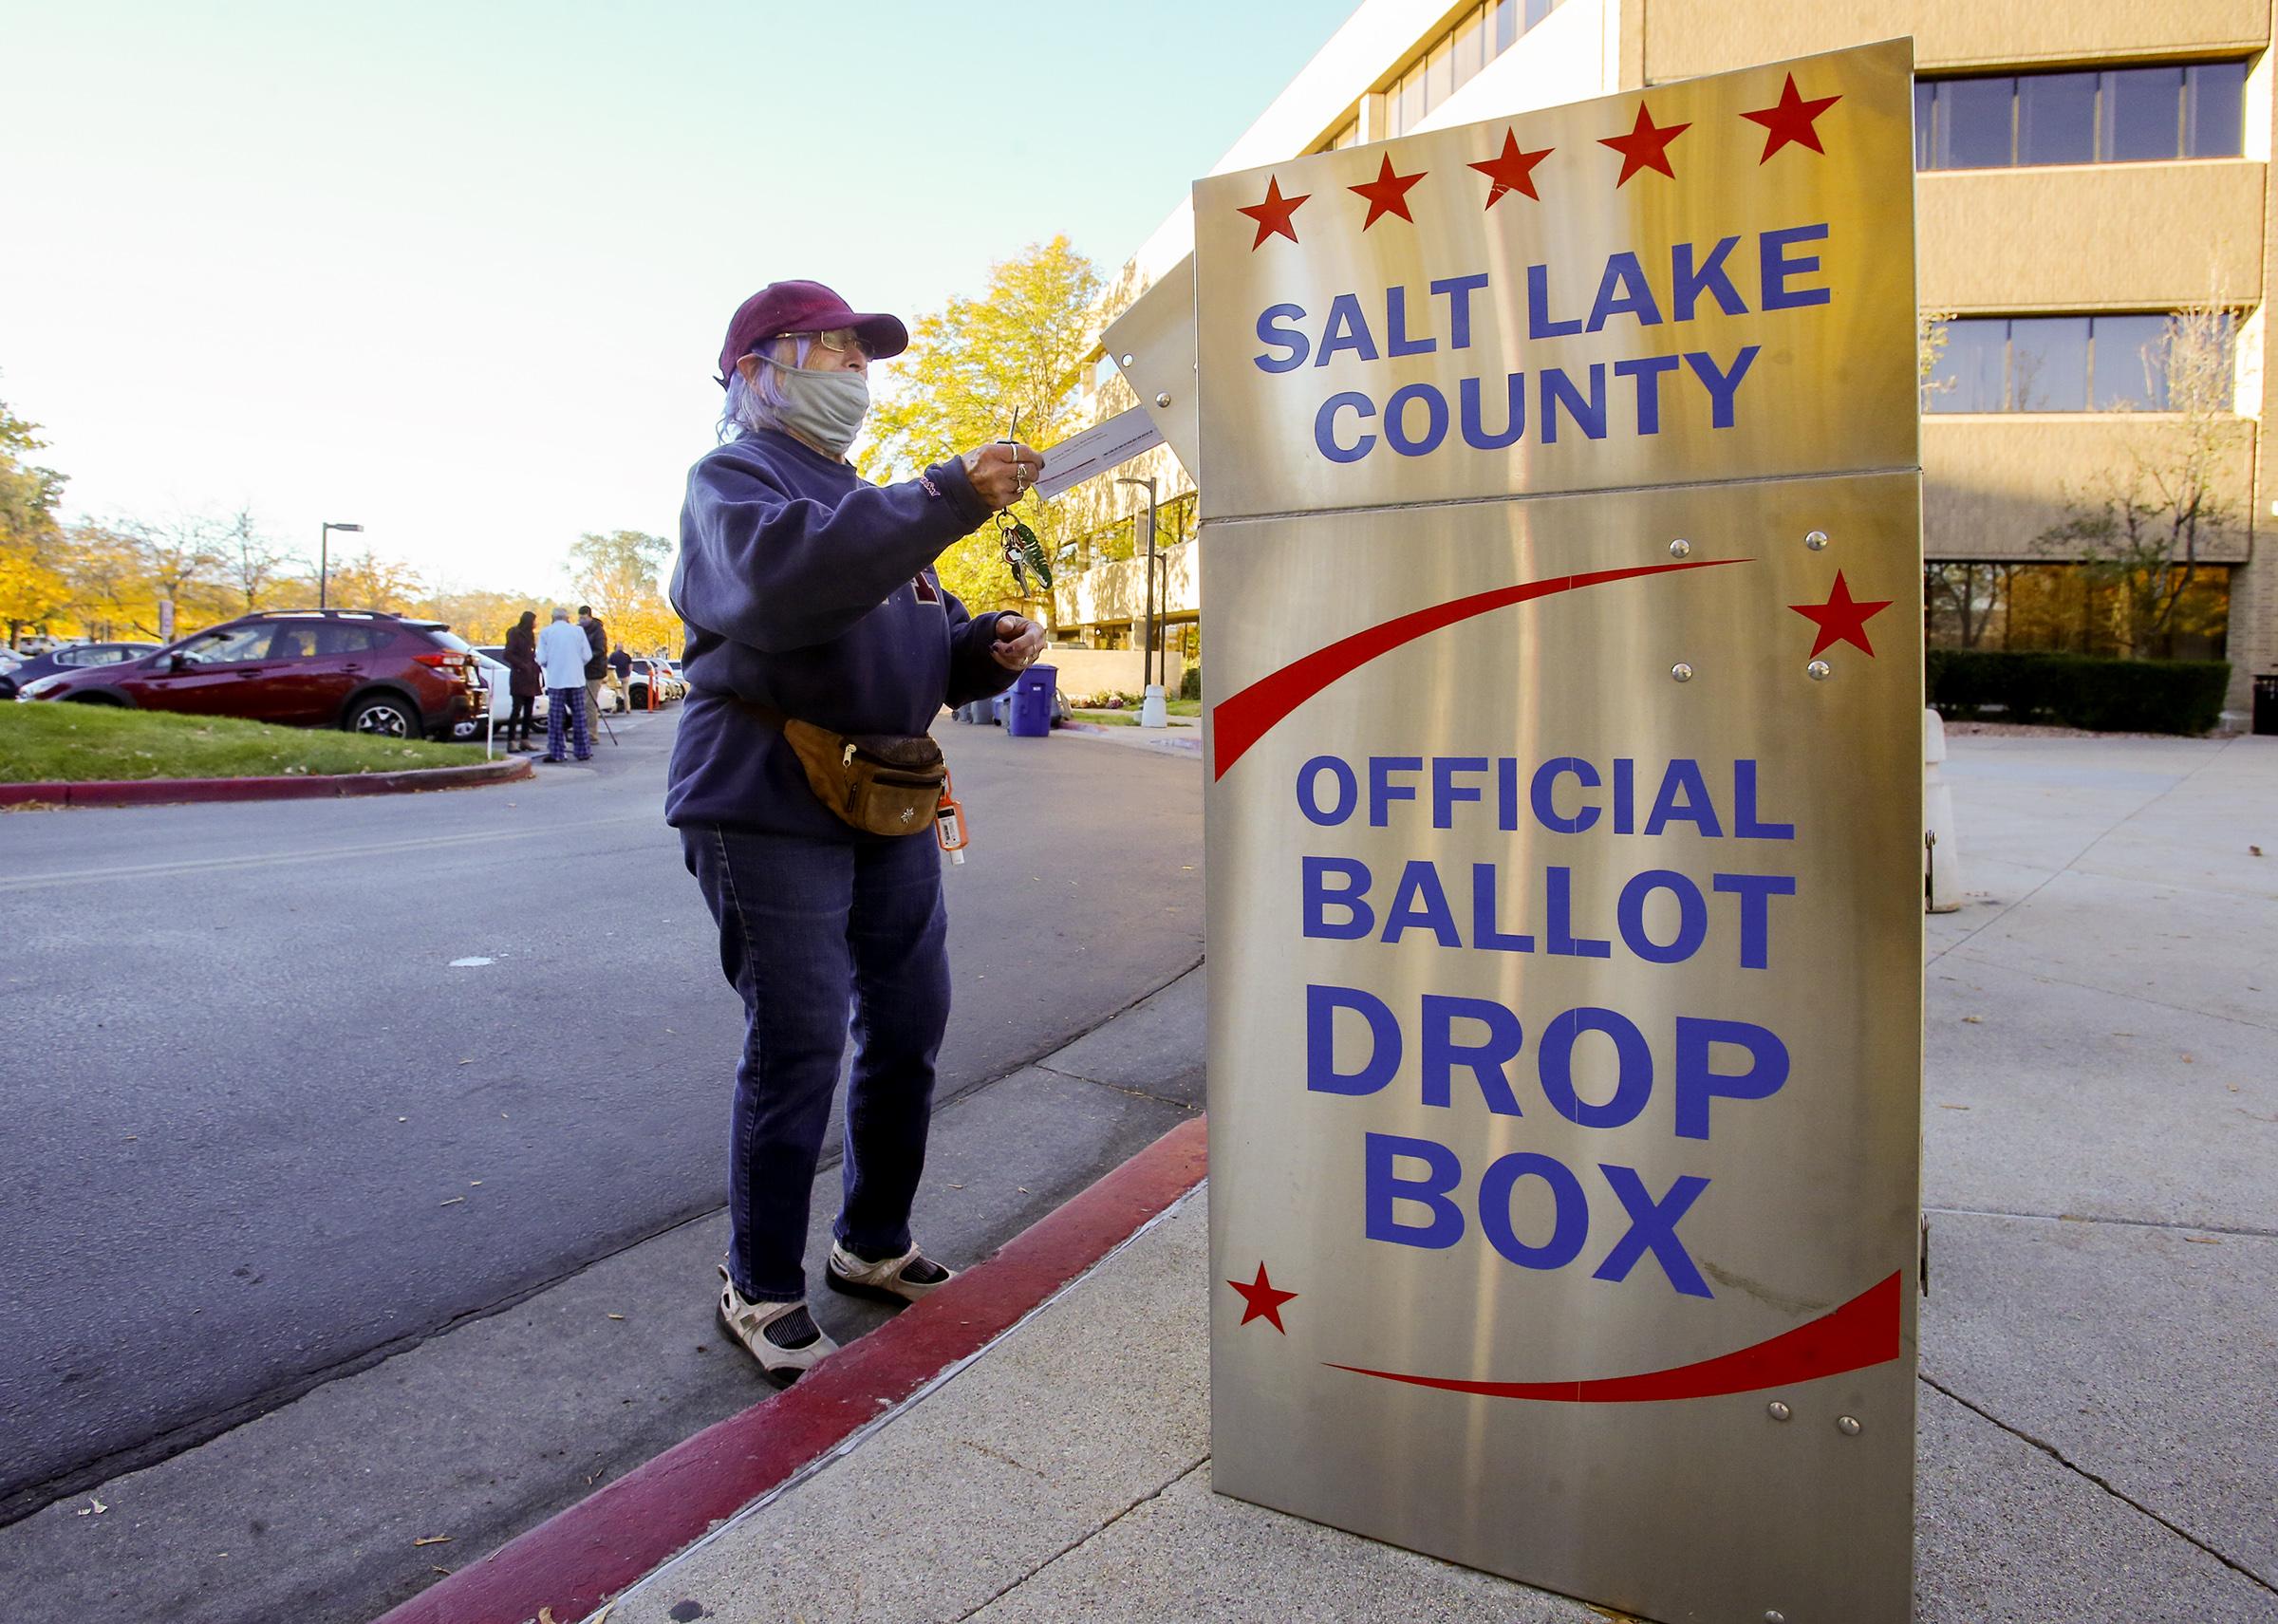 A voter puts a ballot into an official drop box.